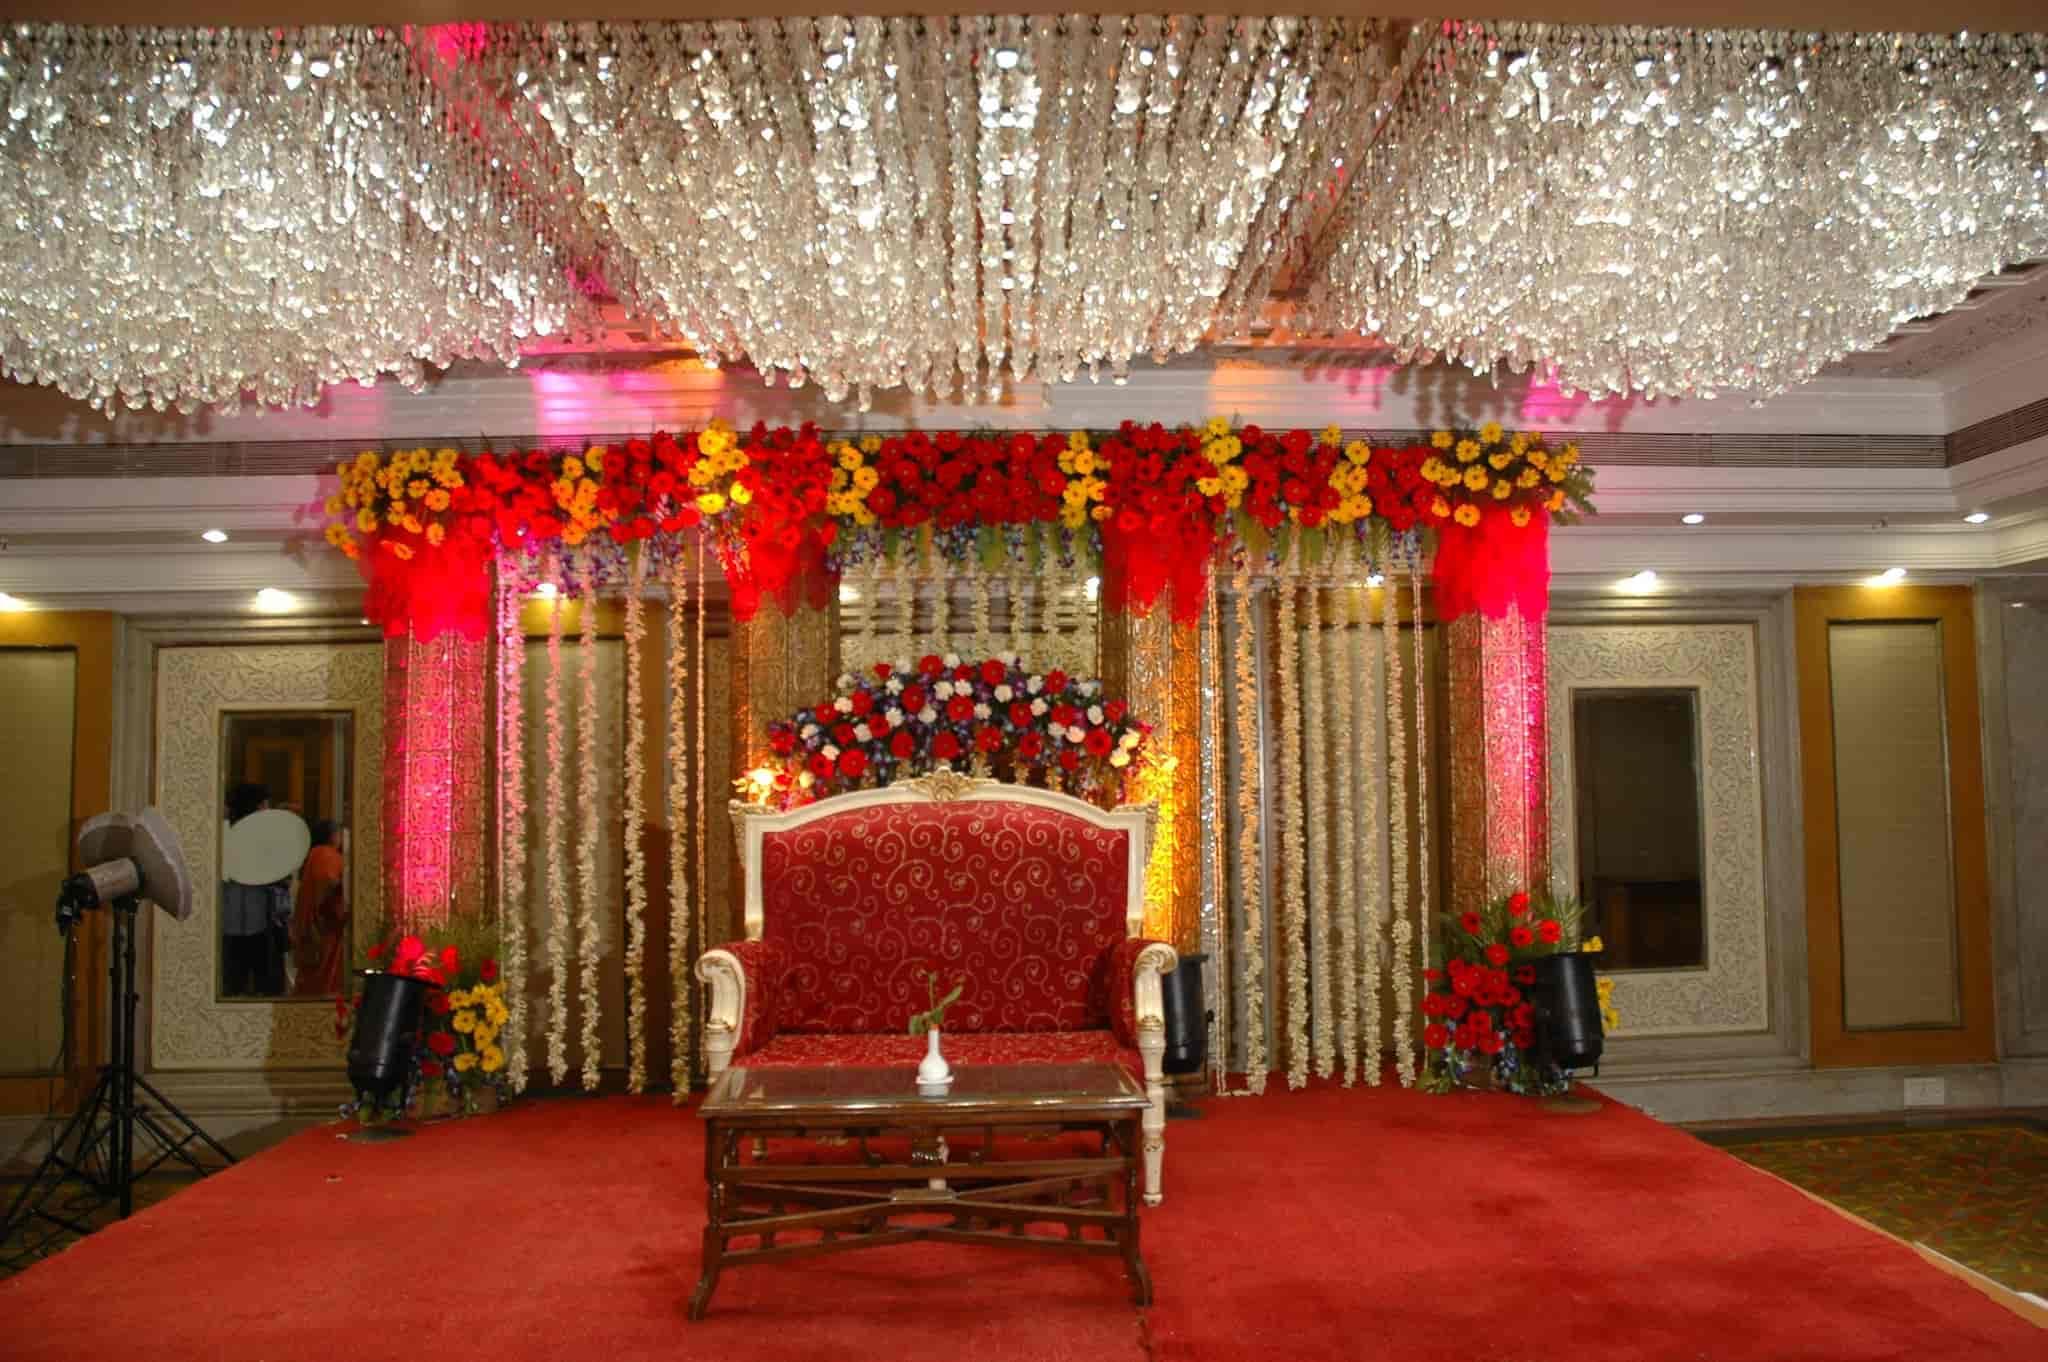 Lavita palace photos gurgaon pictures images gallery justdial stage decorations lavita palace photos delhi banquet halls junglespirit Choice Image